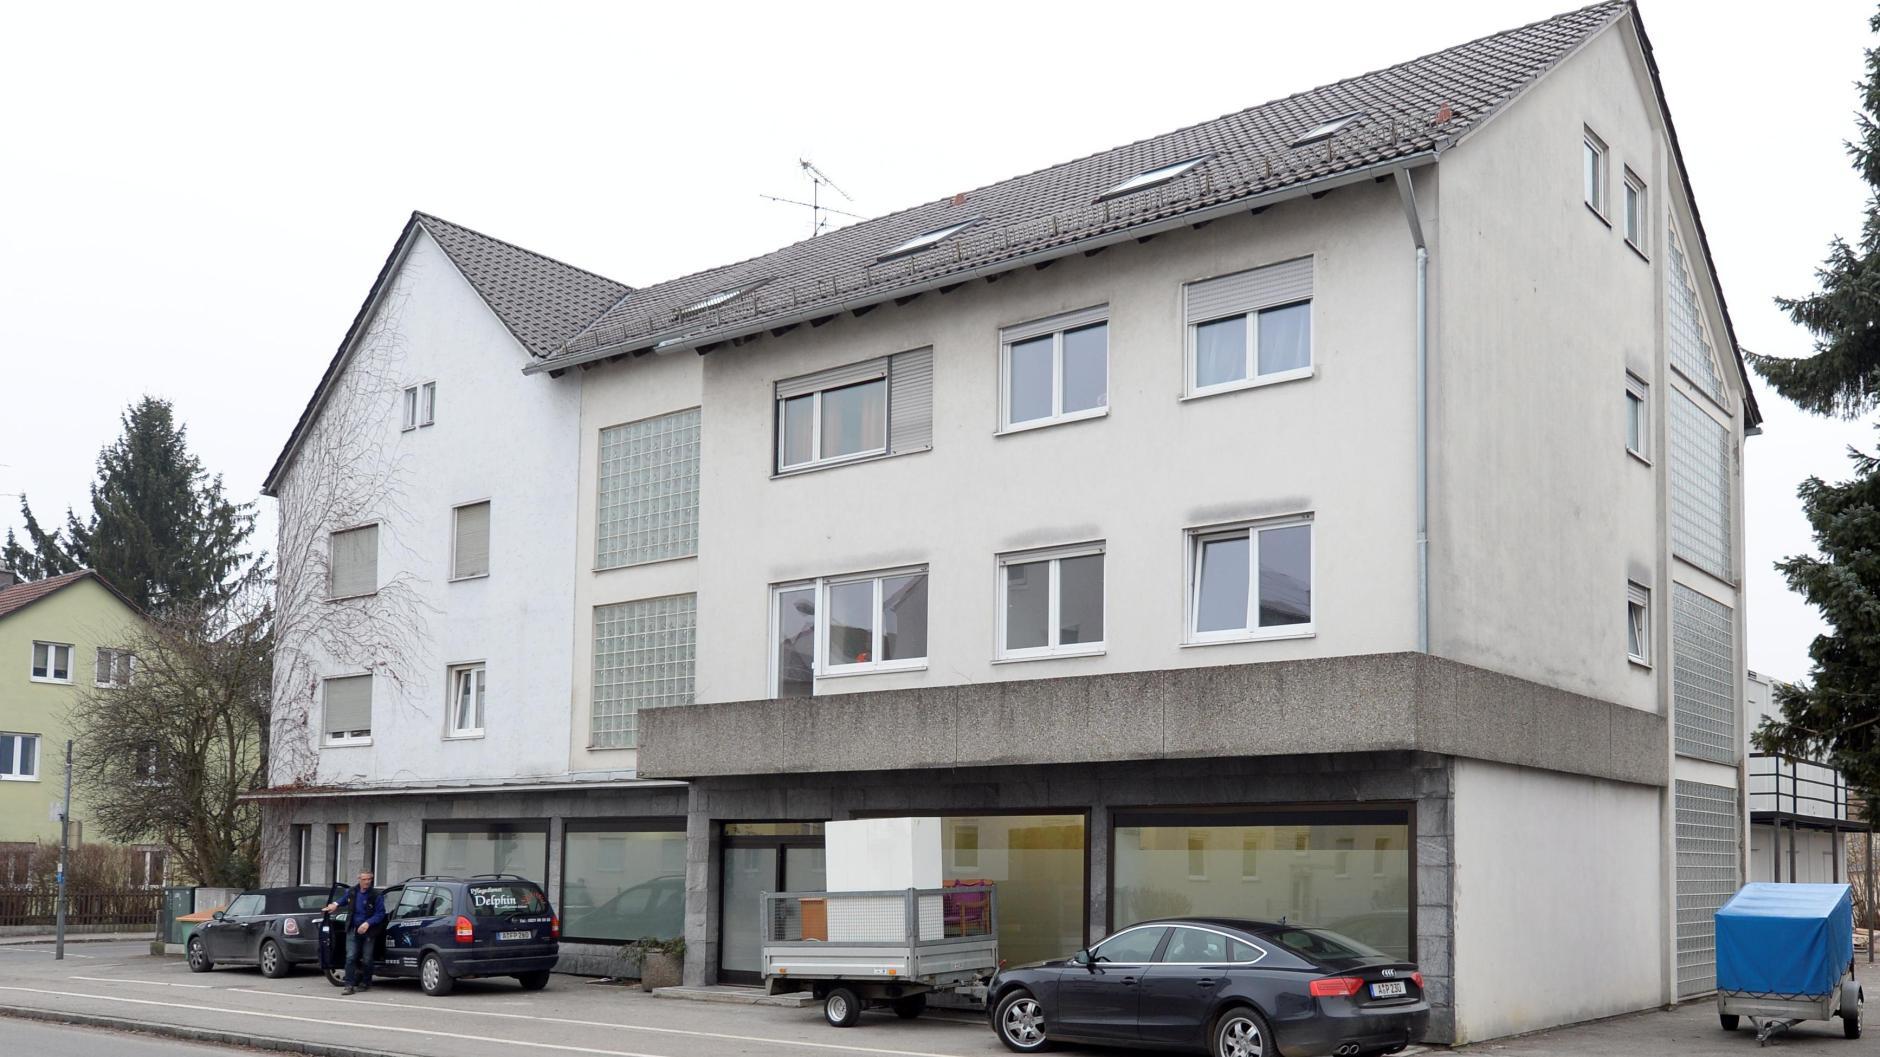 Haus Delphin Augsburg